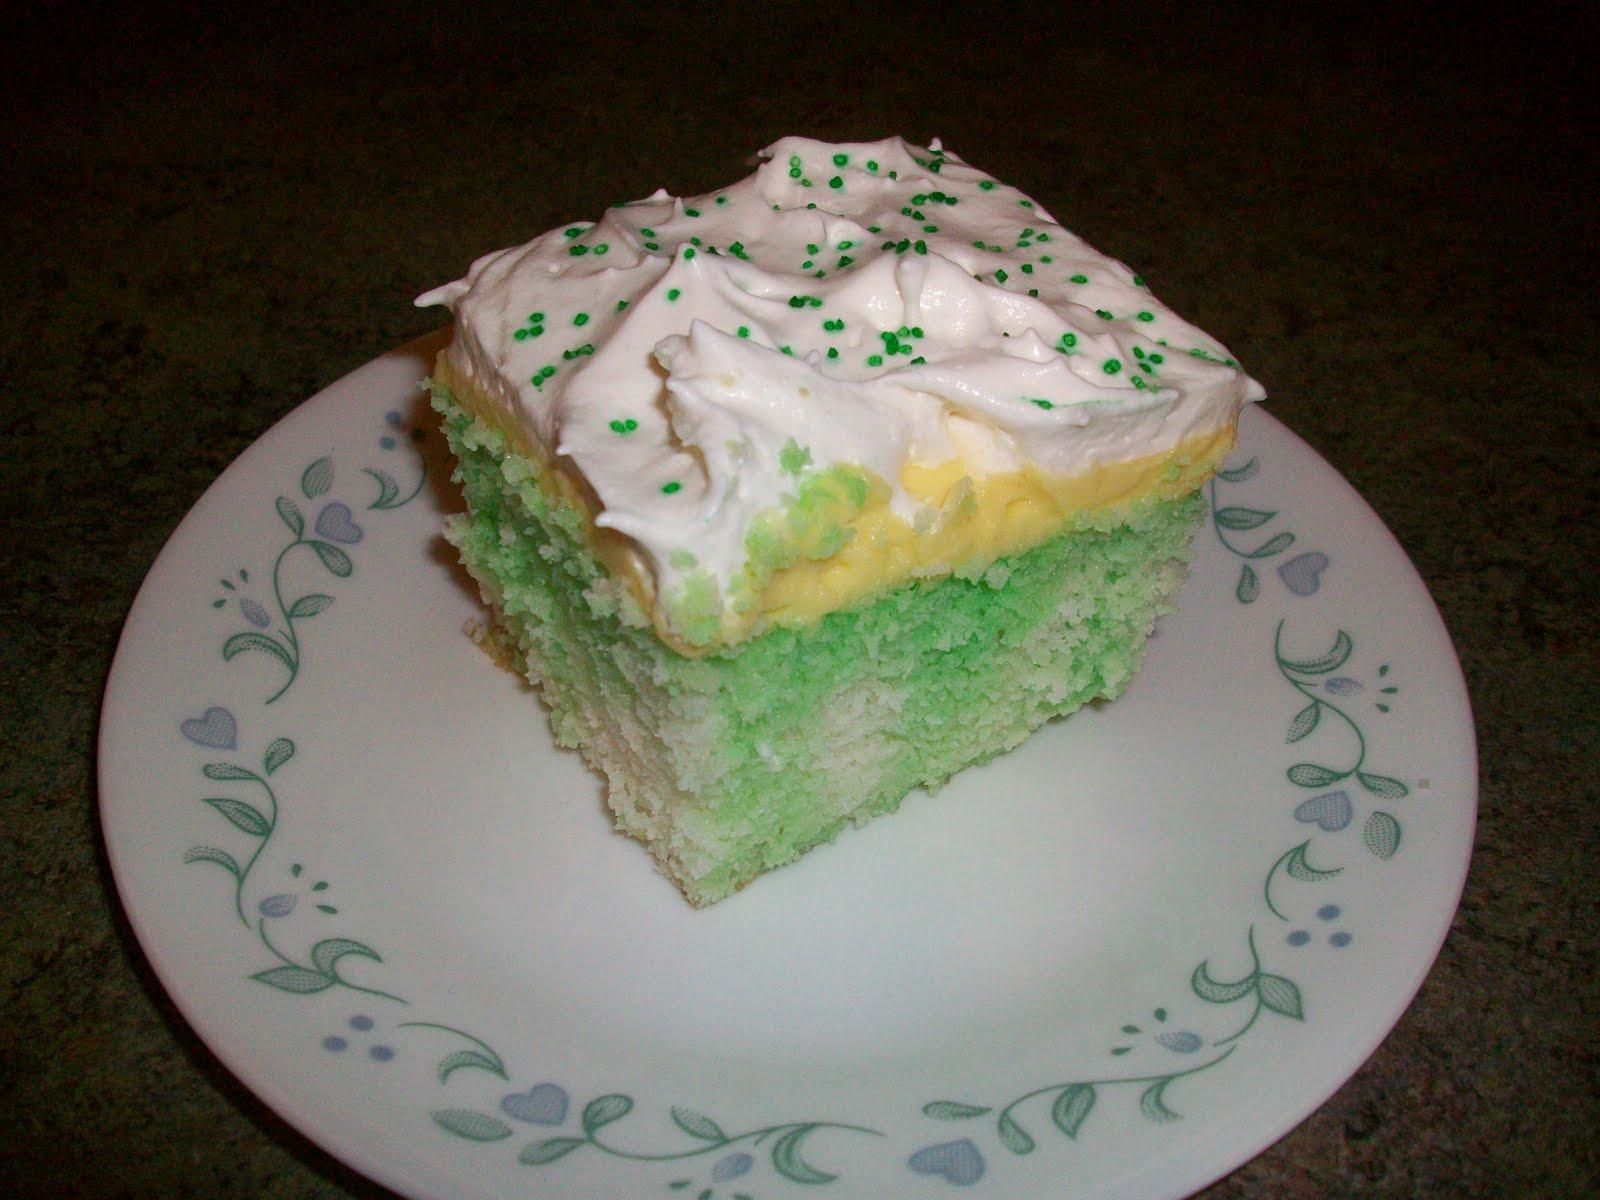 Lemon Jello Cake Recipe Poke: Double The Deliciousness: Lemon Lime Jell-O Poke Cake (Eli